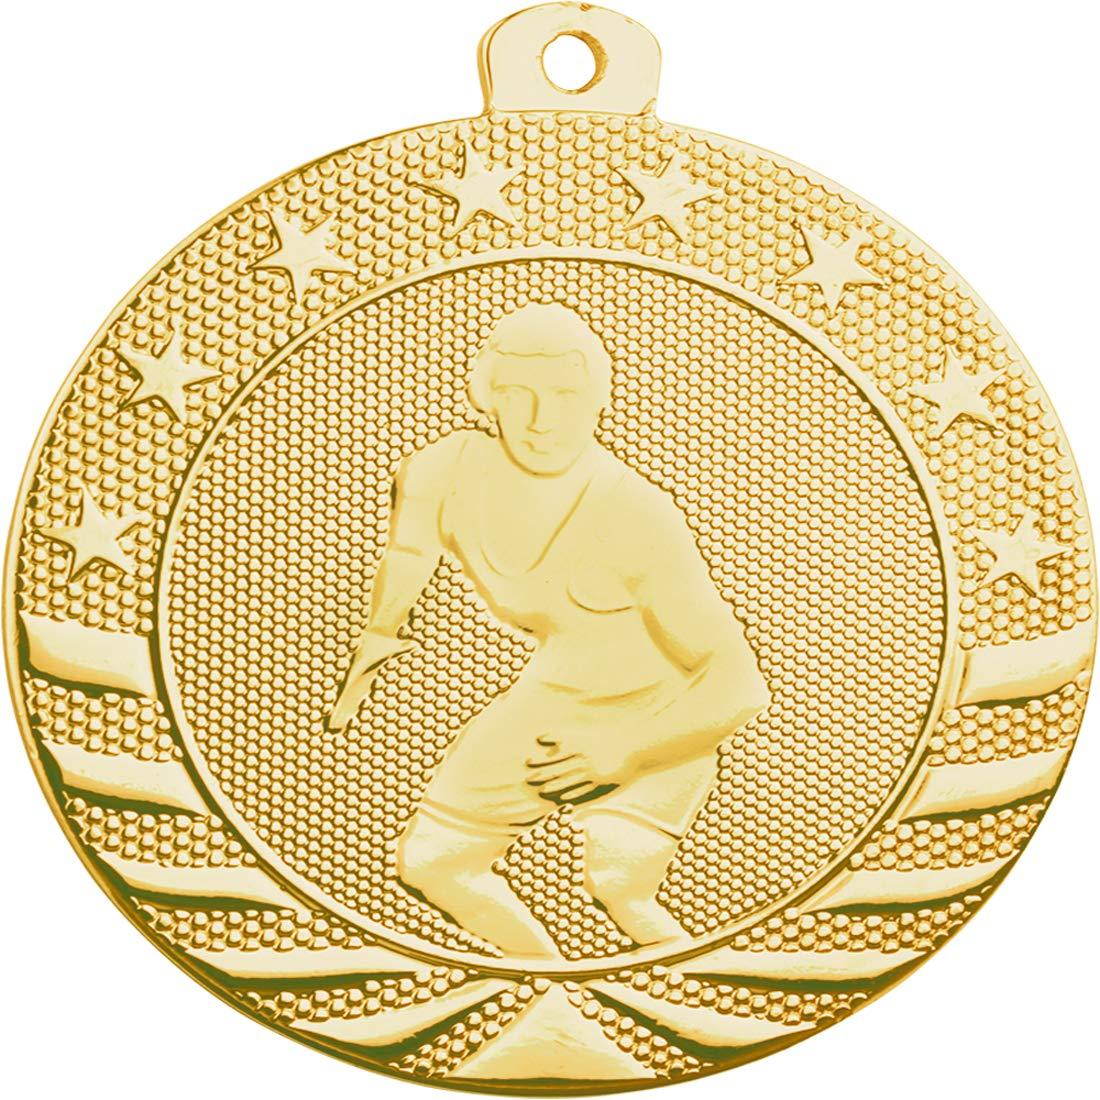 Express Medals レスリング用メダル 2インチ ゴールド メダル トロフィー 首リボン付き ソリッドメタル 賞 10個パック B07NZ4YXTK